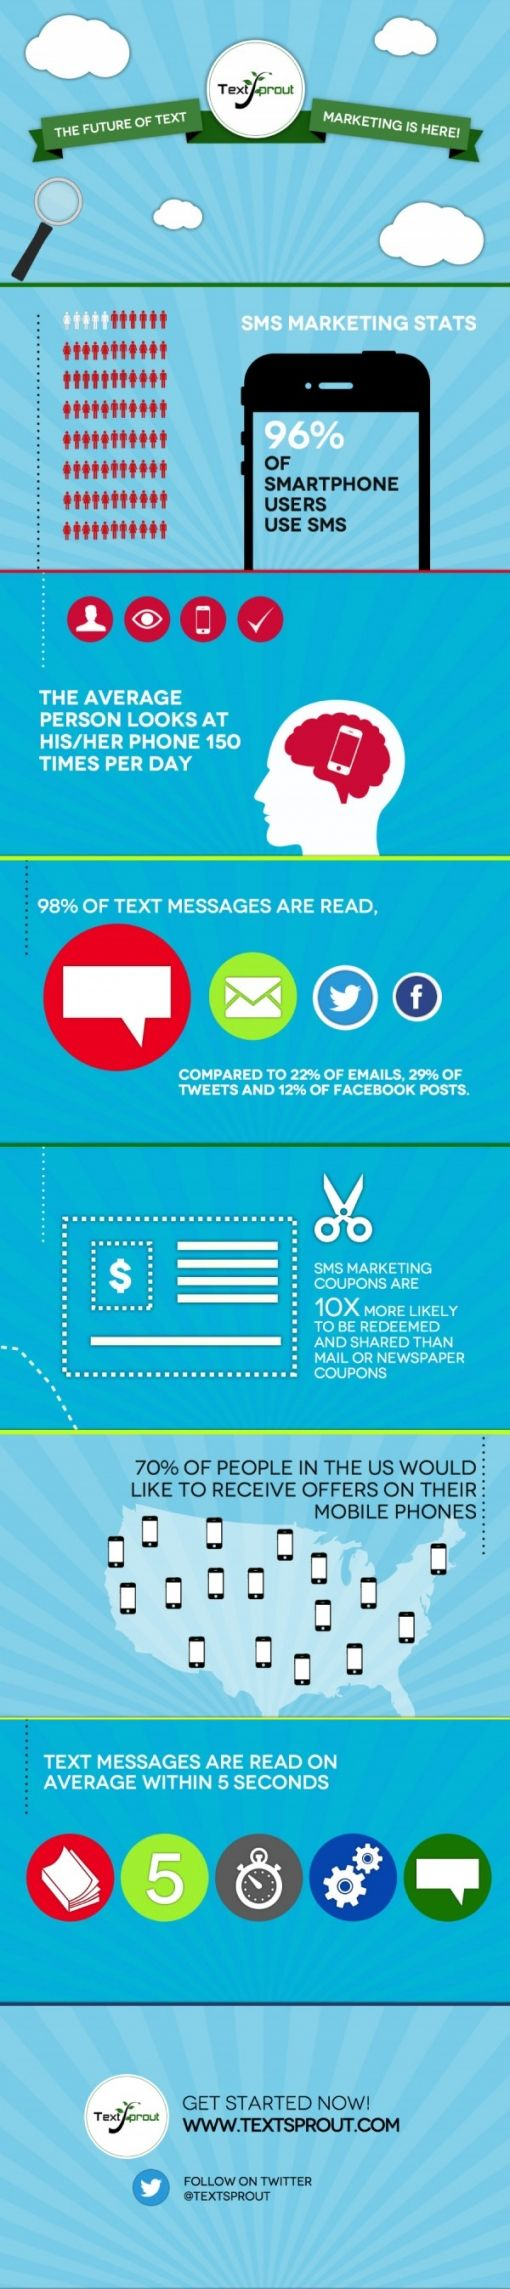 sms-marketing-stats-and-fun-facts_51e3fa96752c9.jpg-e1373978497232